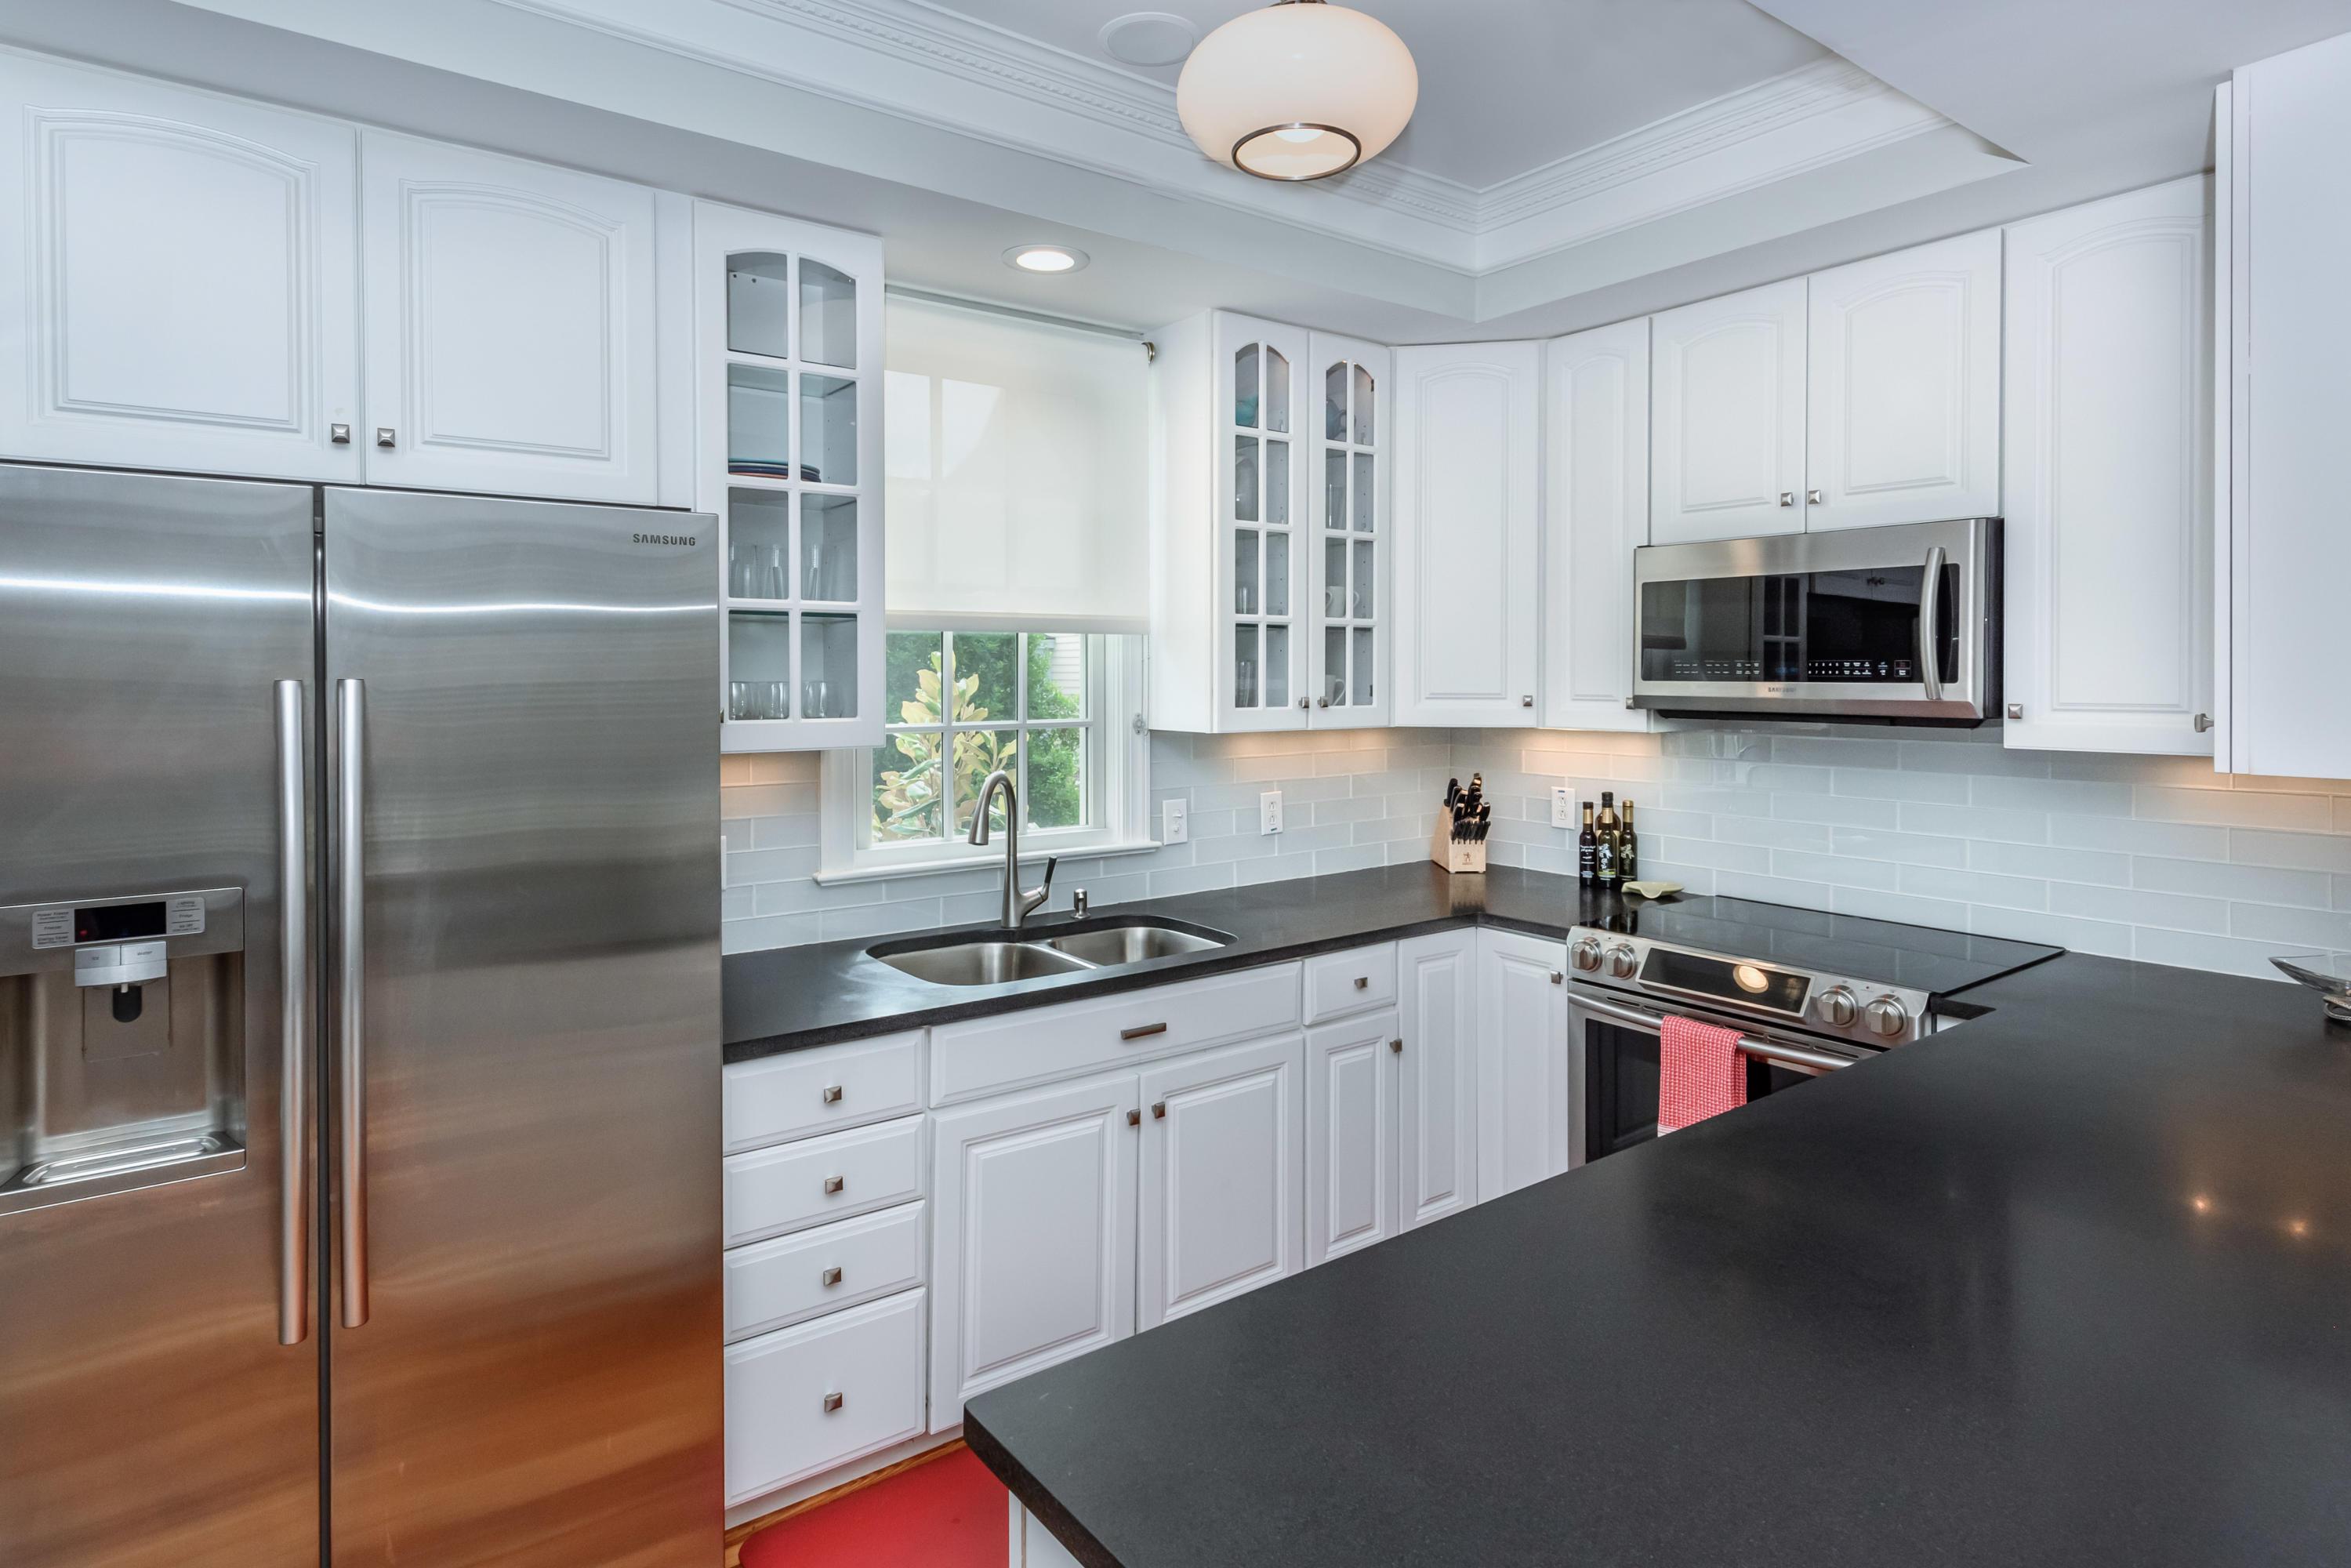 Harleston Place Homes For Sale - 32 Harleston, Charleston, SC - 27